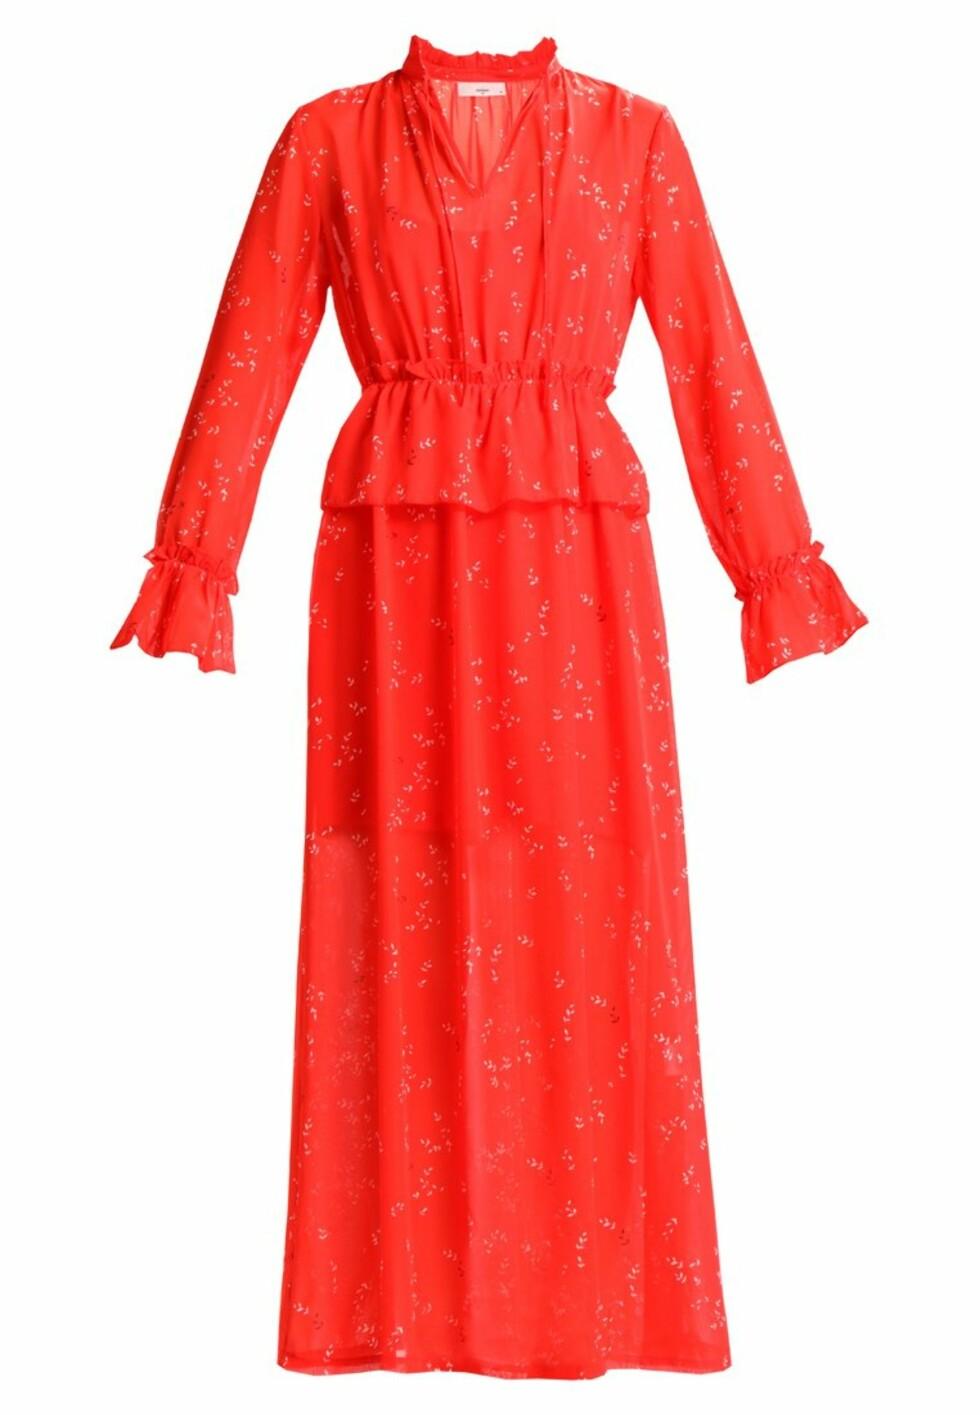 Kjole fra Minimum |999,-| https://www.zalando.no/minimum-amabel-fotsid-kjole-fiery-red-mi421c06o-g11.html